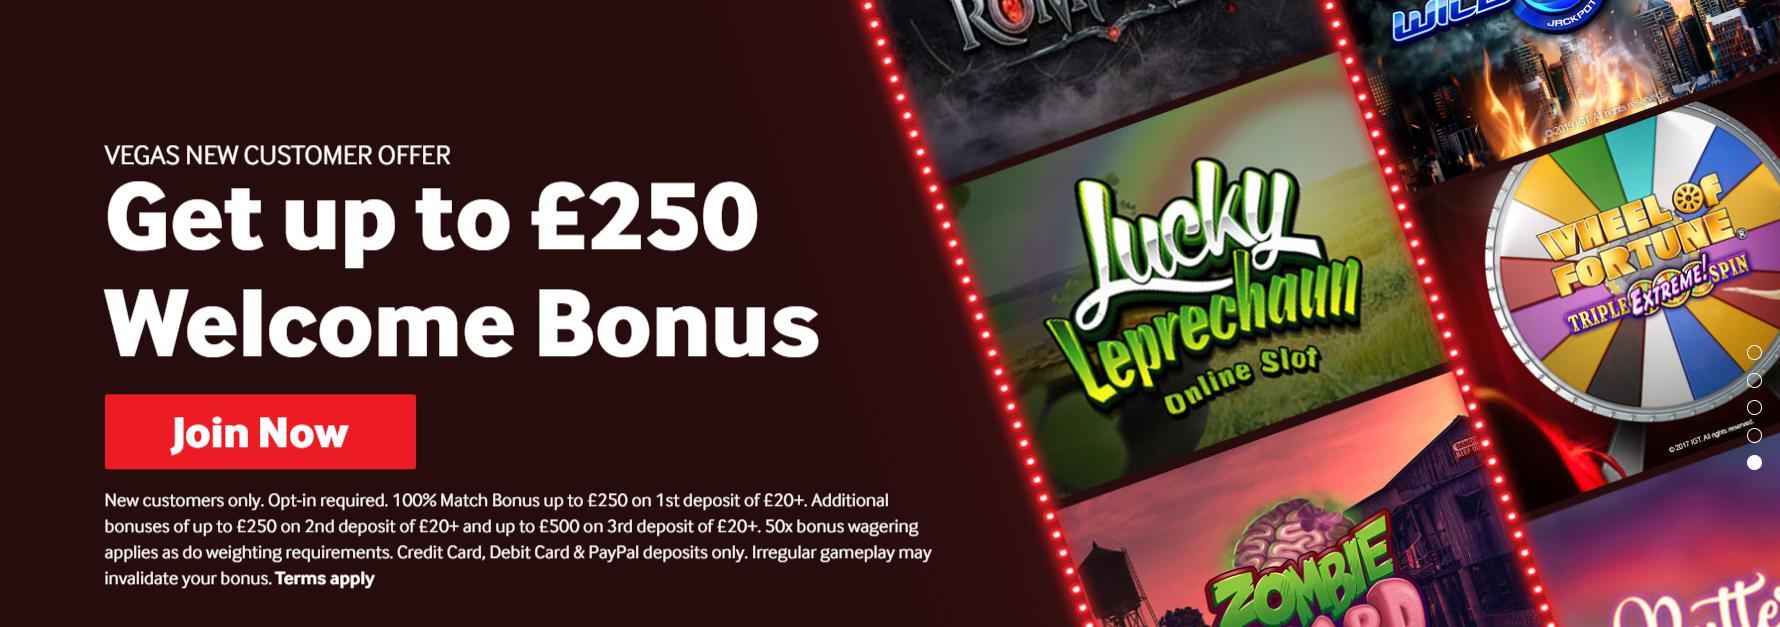 best slots bonus example 250 welcome bonus